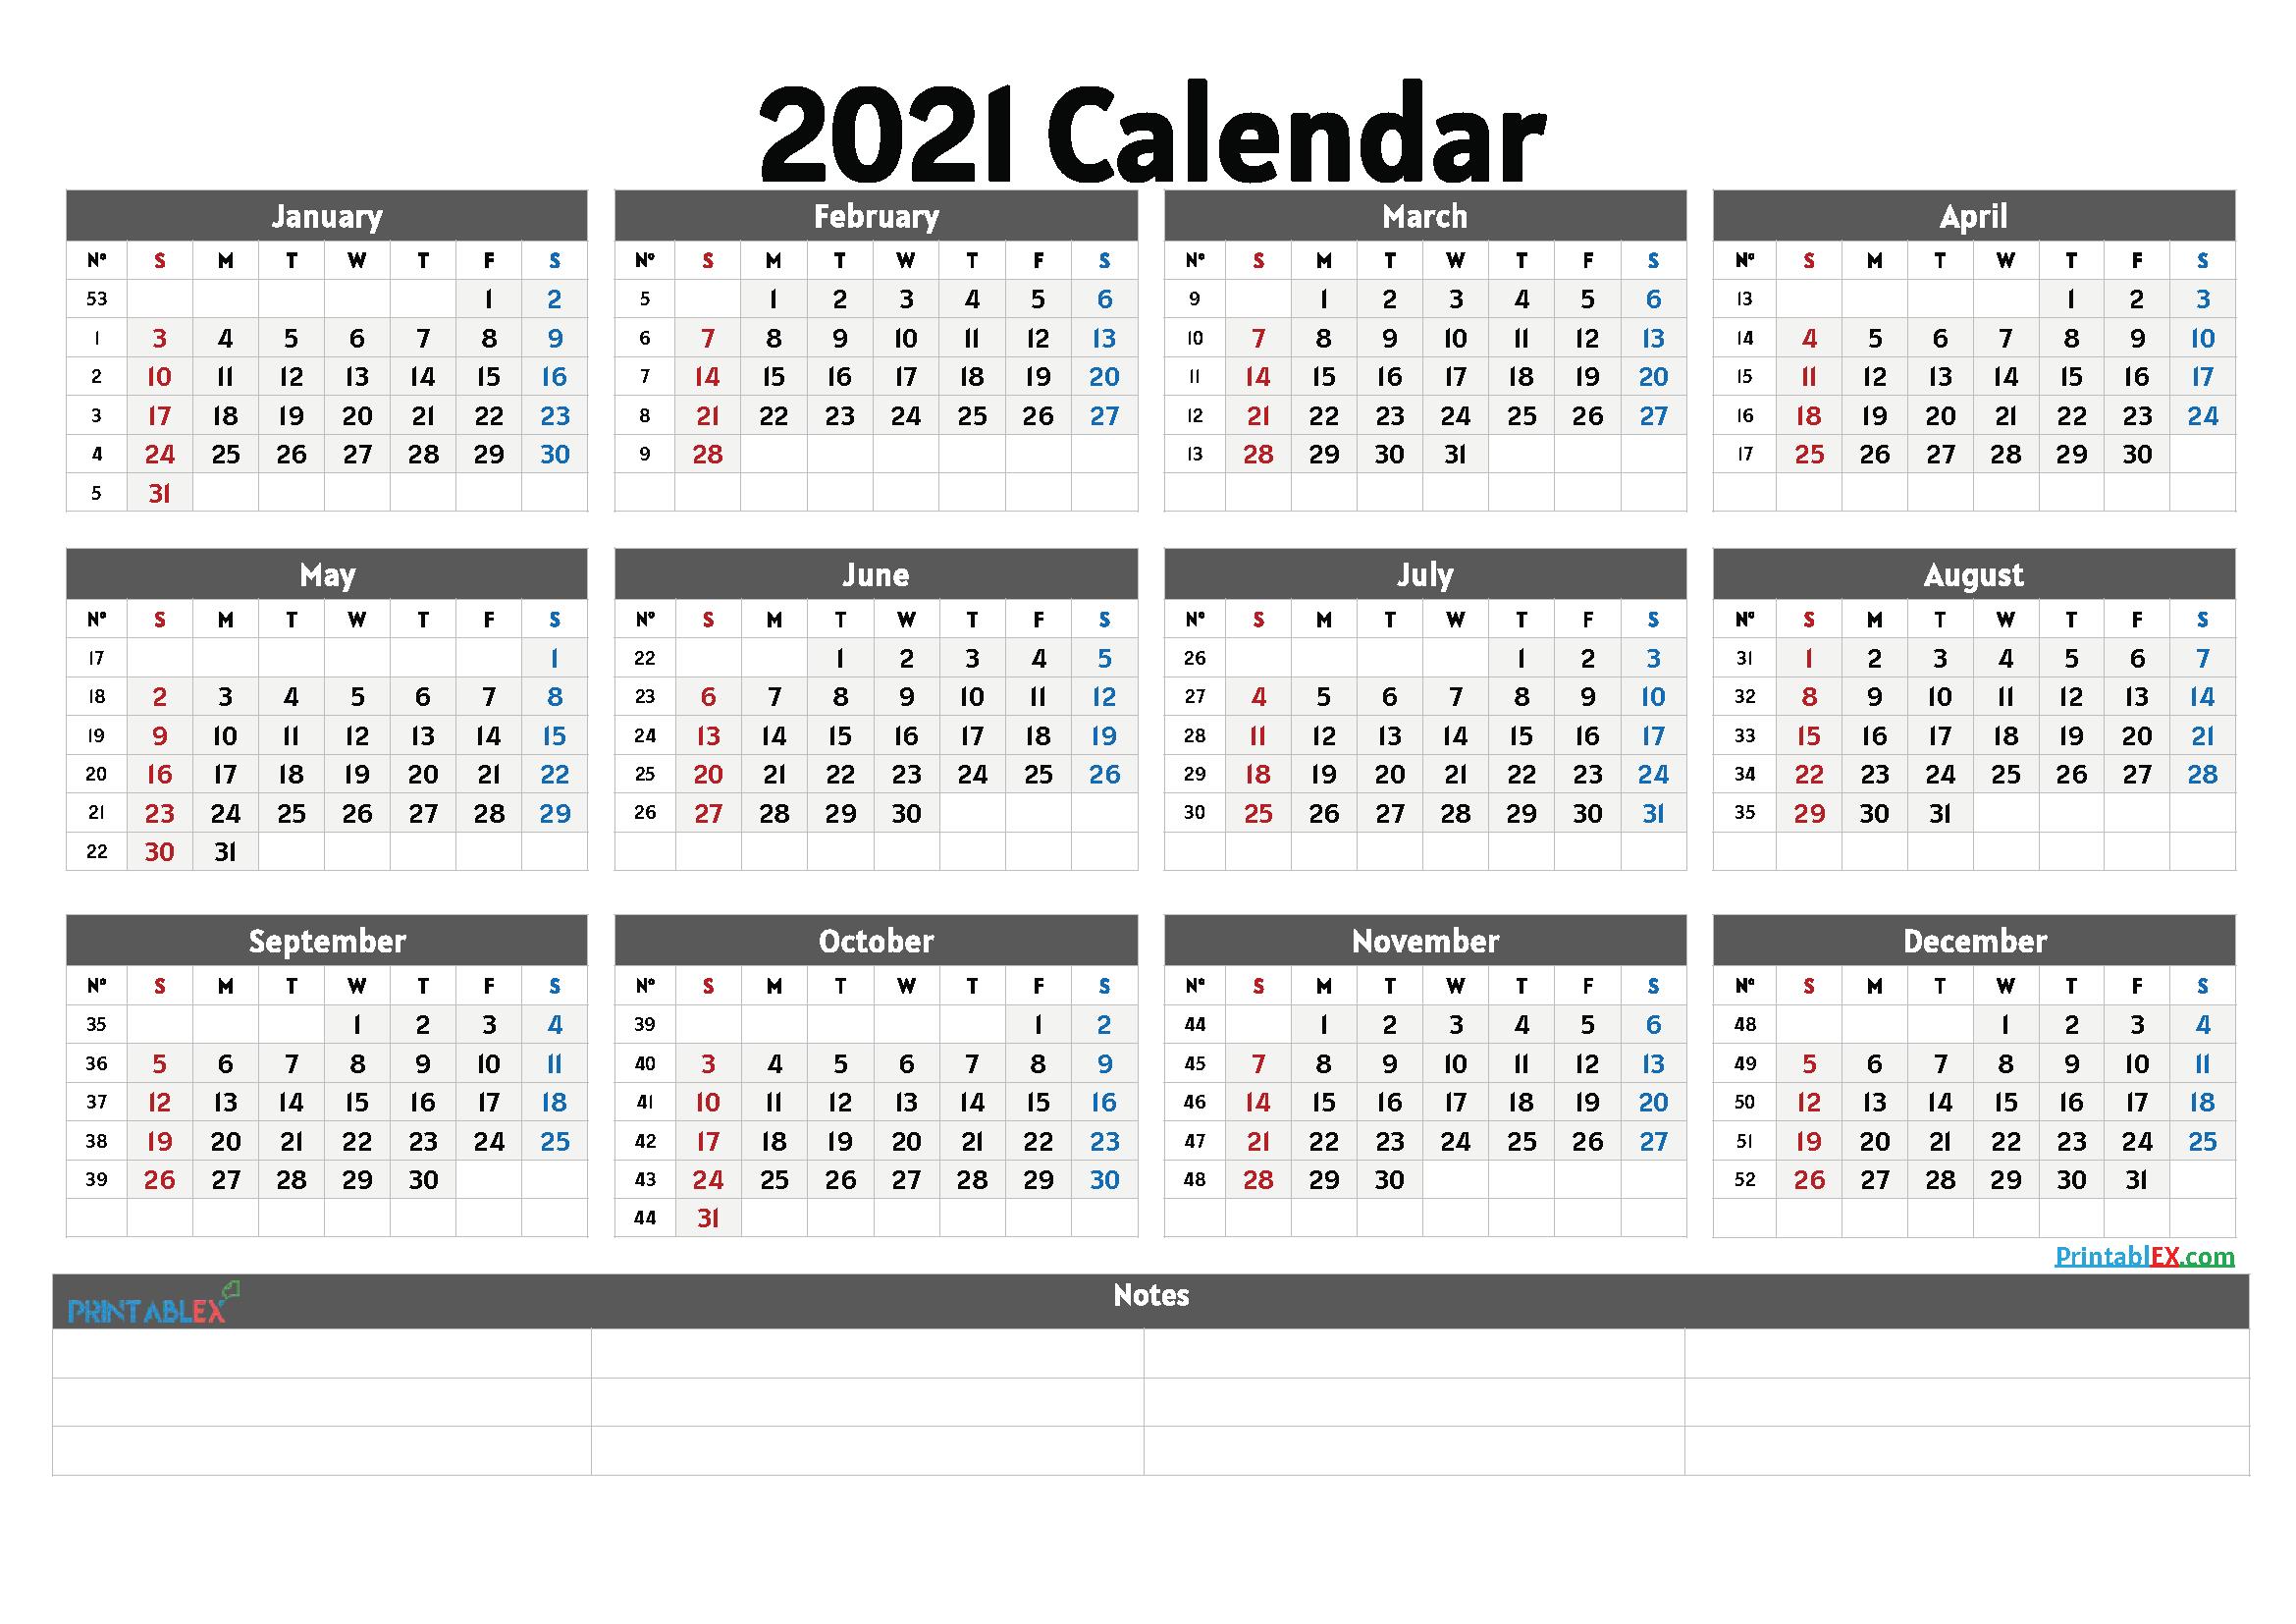 Cute Printable Calendar 2021 - 21Ytw27 - Free Printable Intended For View January 2021 Calendar